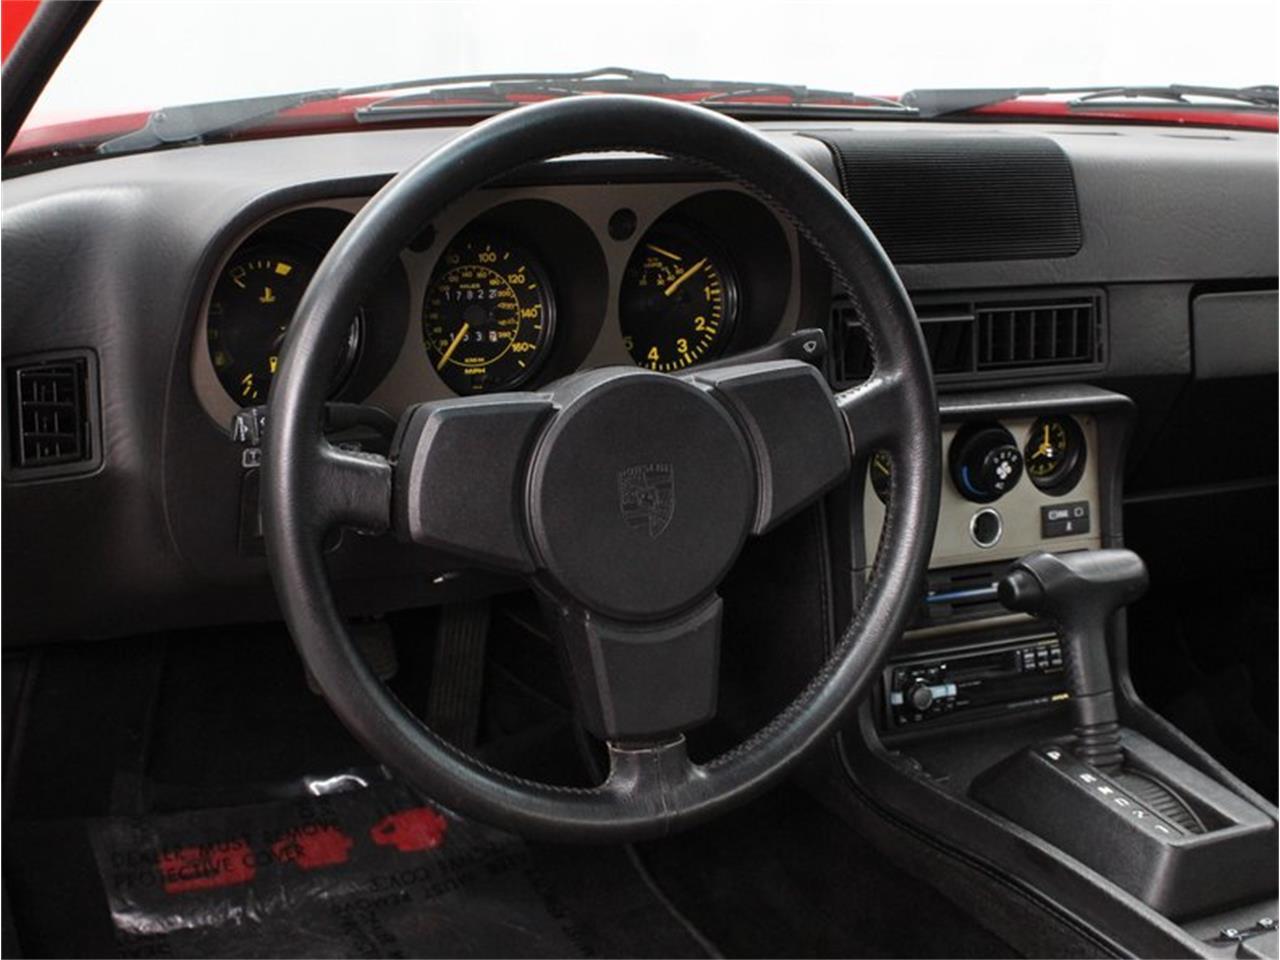 1984 Porsche 944 (CC-1388503) for sale in Christiansburg, Virginia